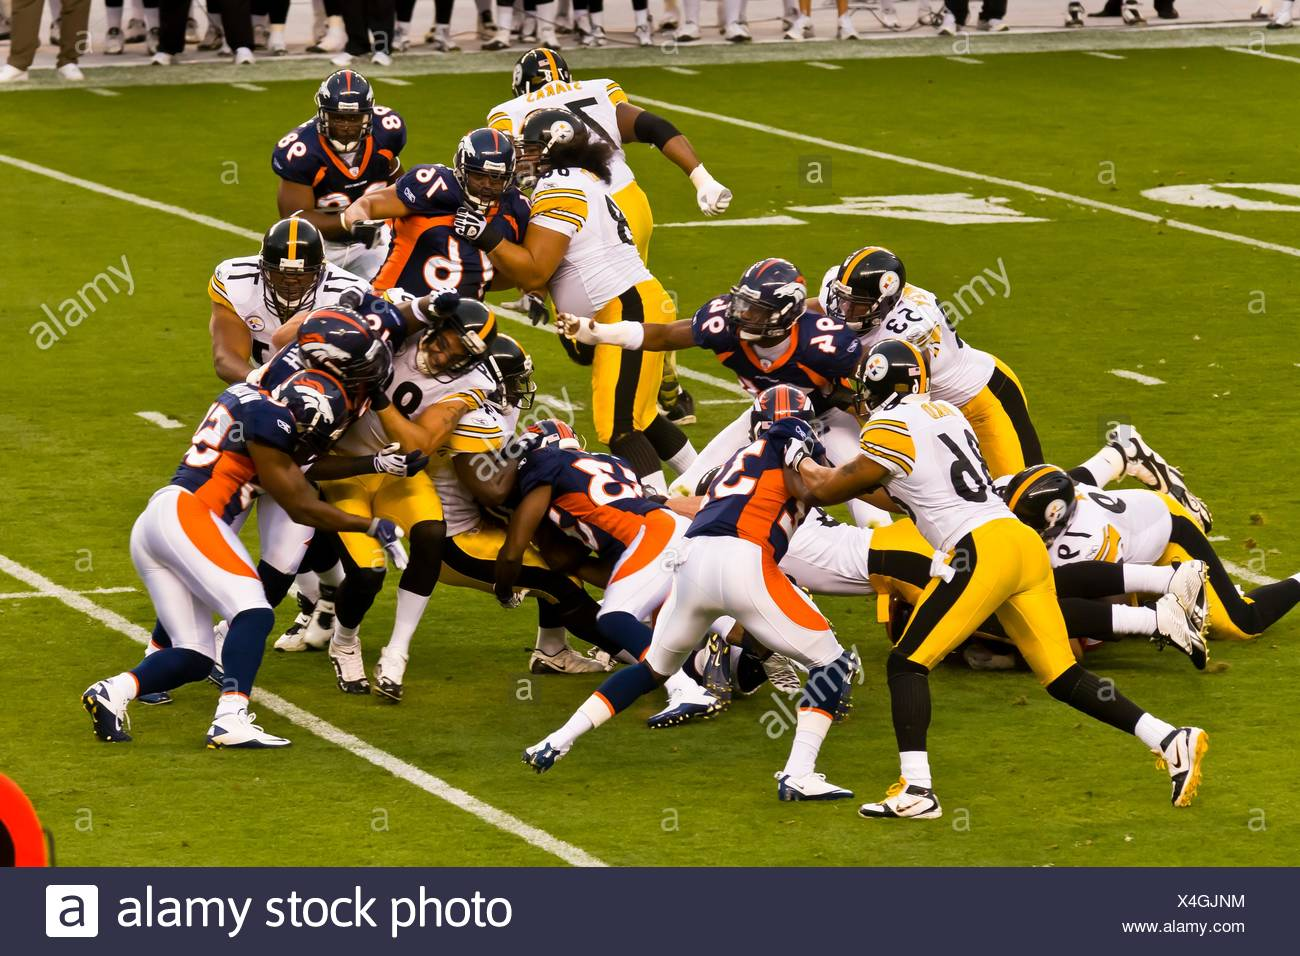 Denver Broncos vs  Pittsburgh Steelers NFL football game, Invesco Field at Mile High stadium, Denver, Colorado USA - Stock Image